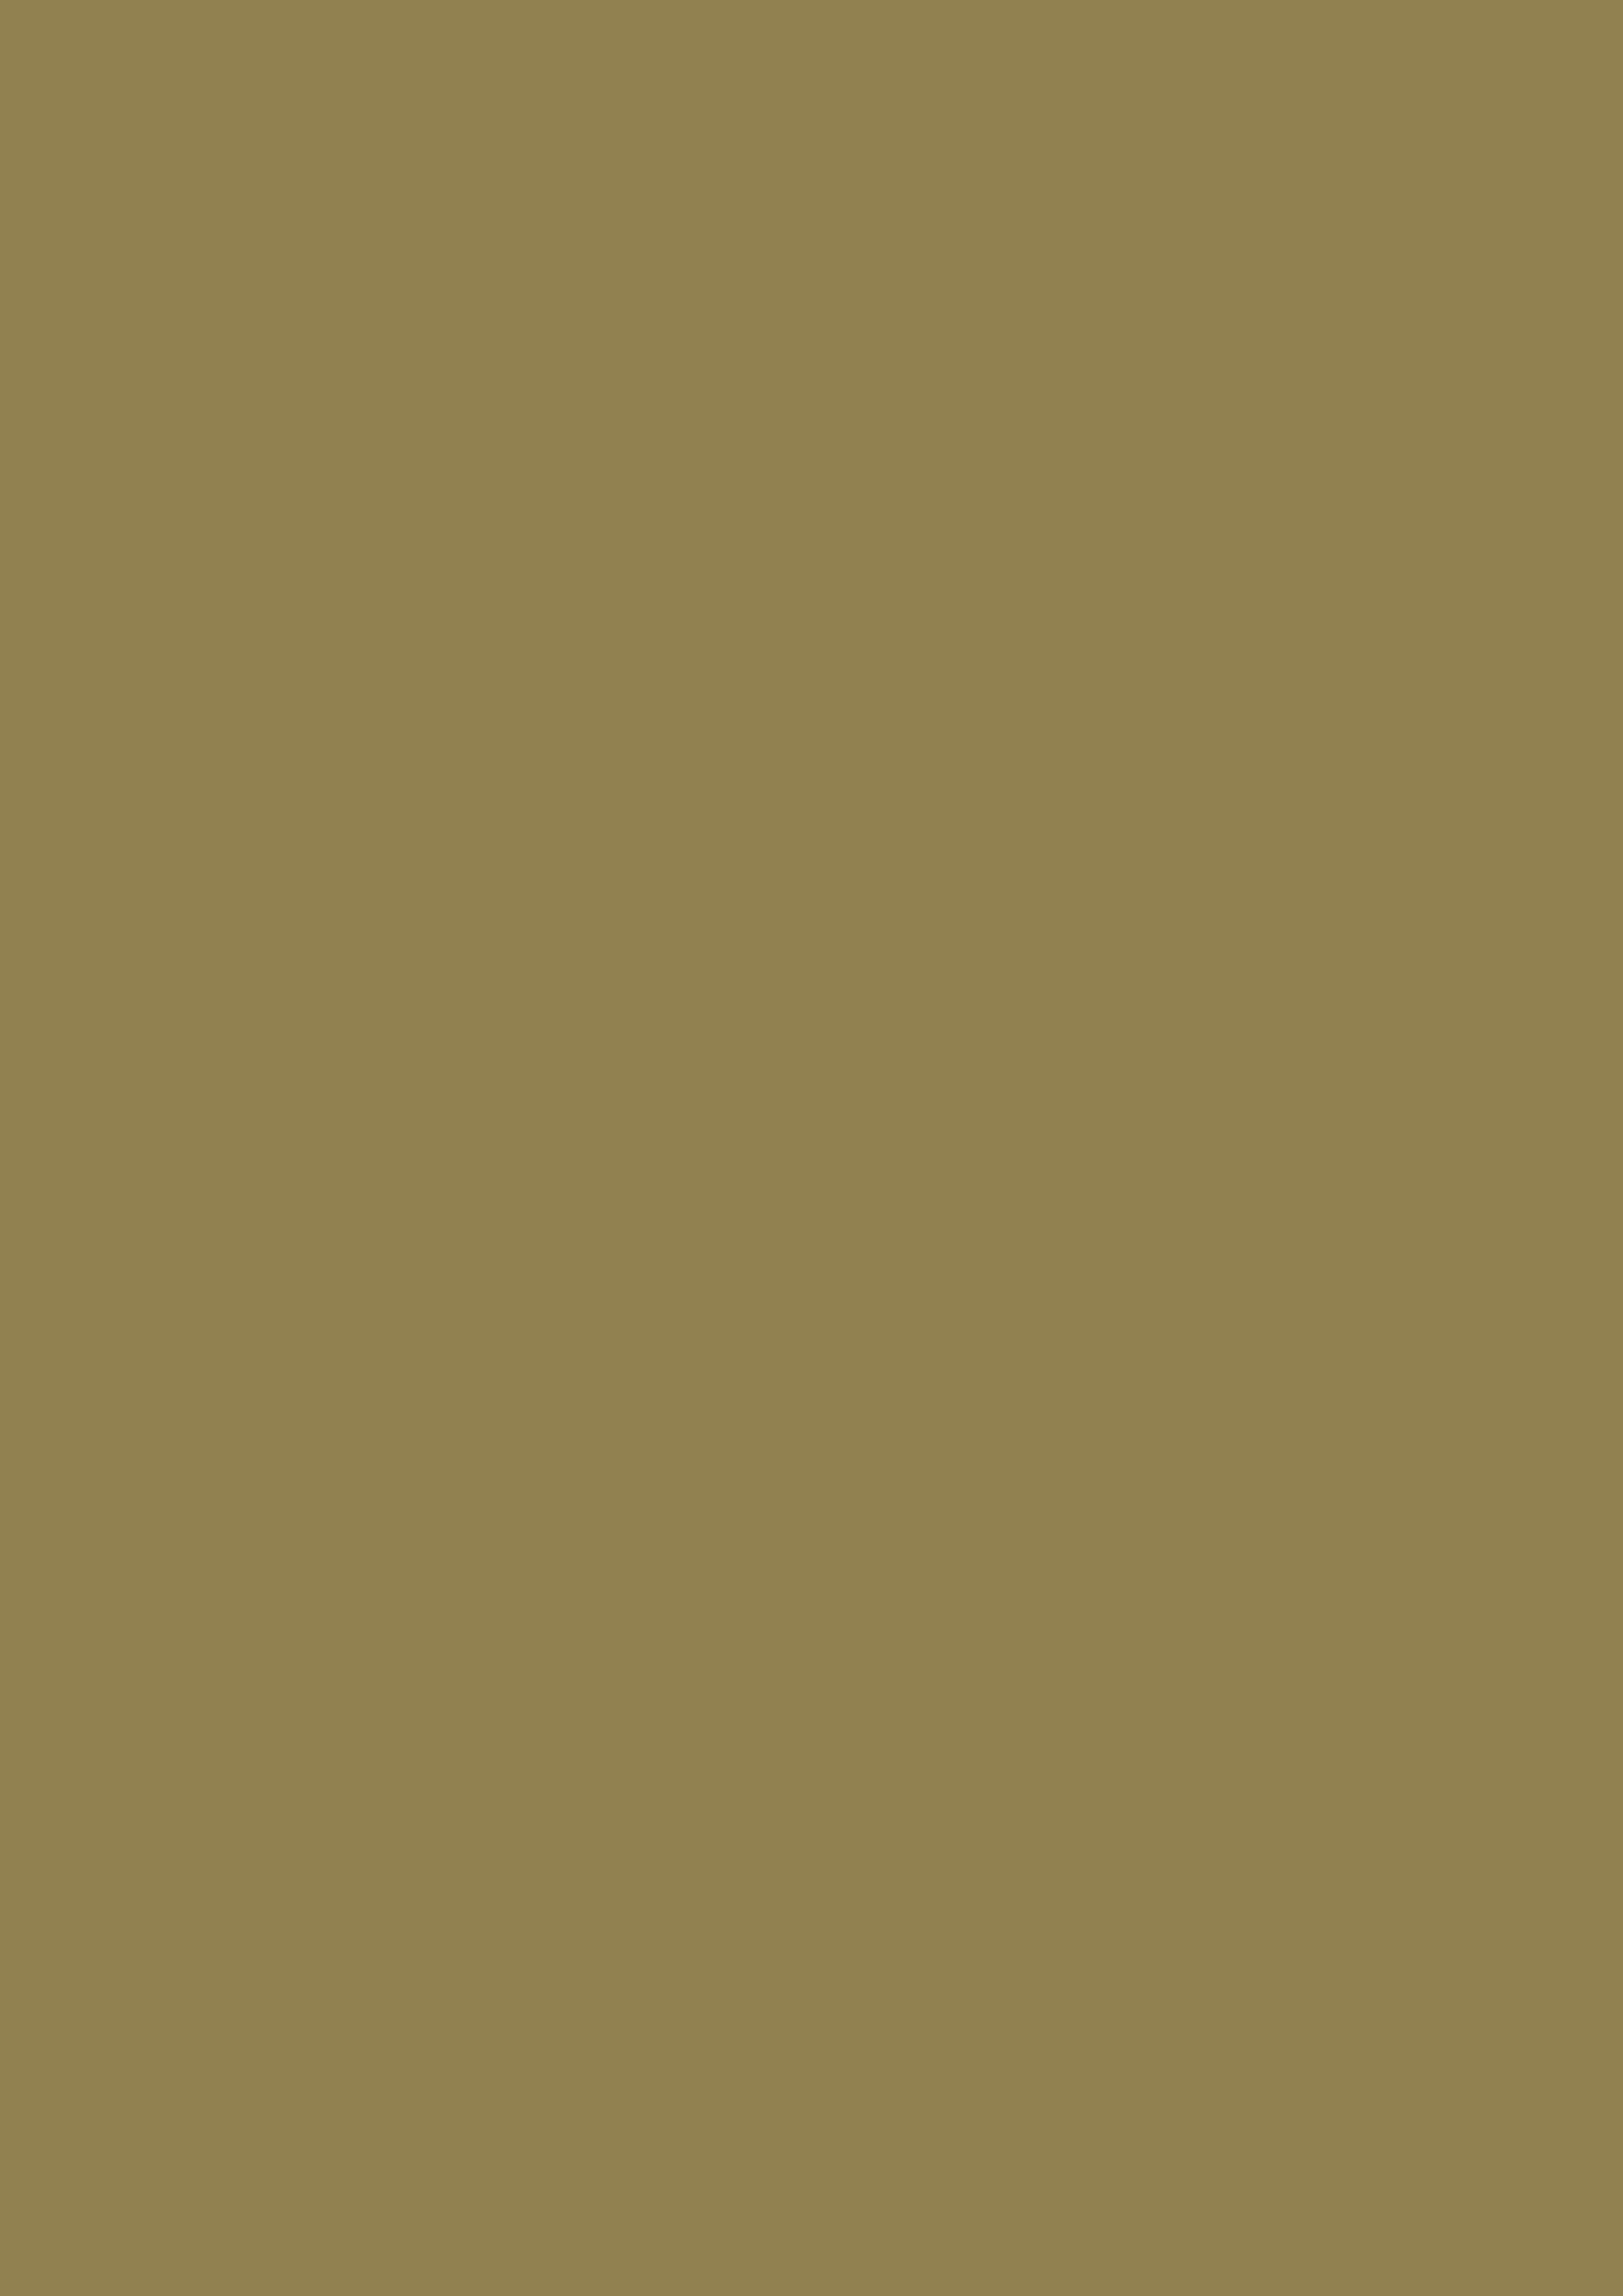 2480x3508 Dark Tan Solid Color Background